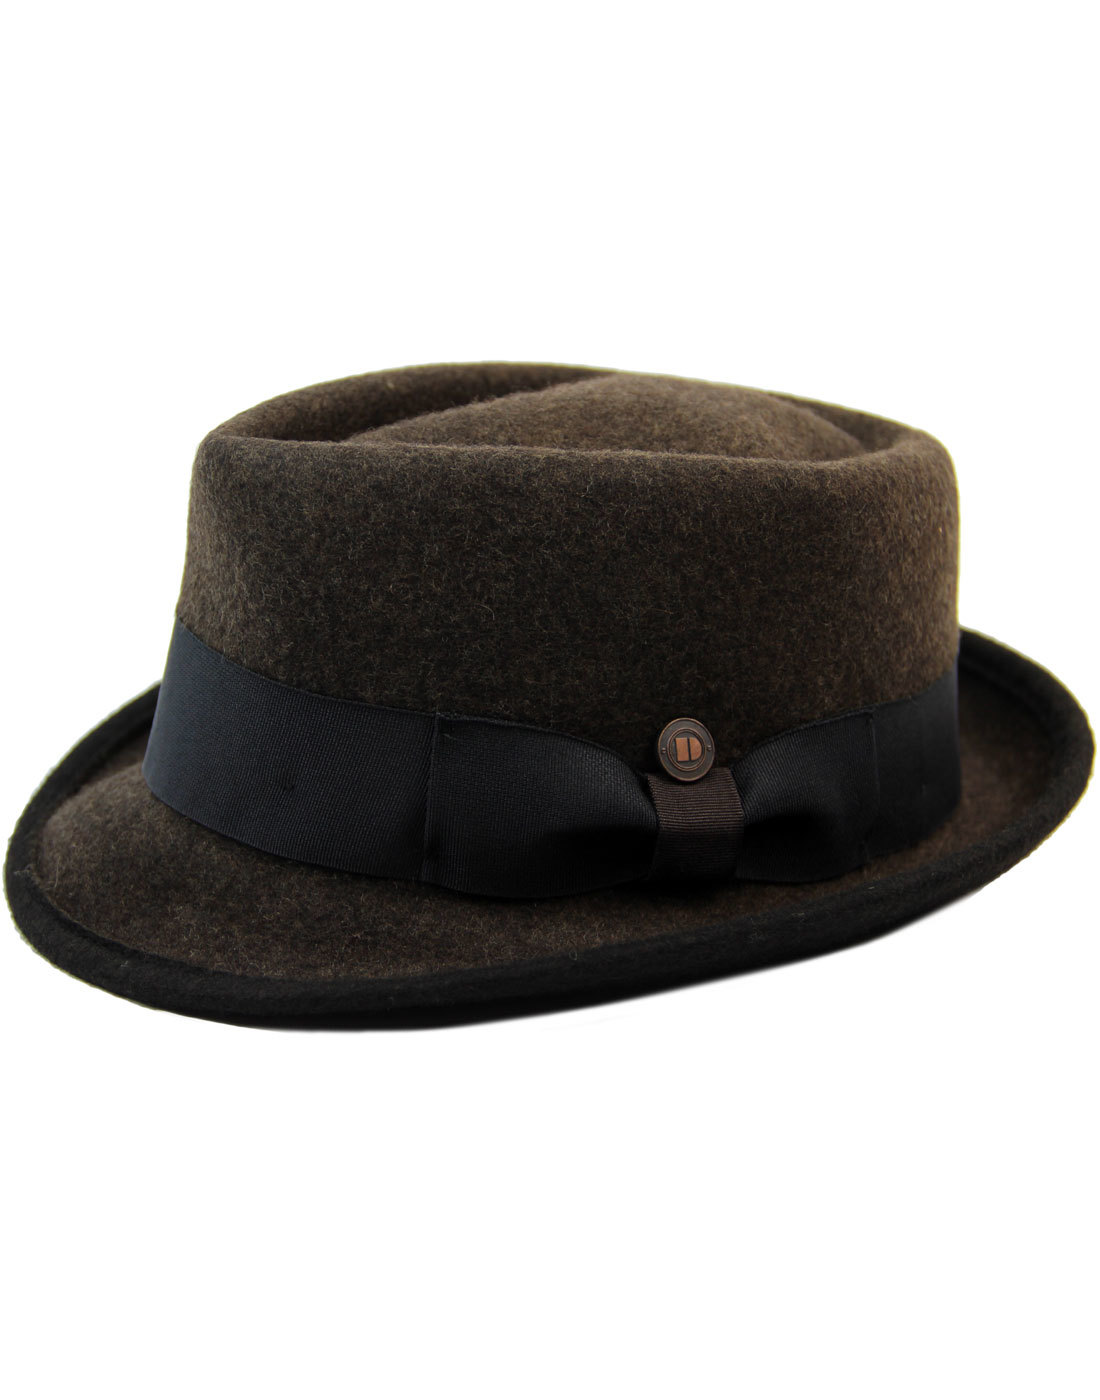 Jacson DASMARCA Retro 60s Mod Wool Trilby Hat